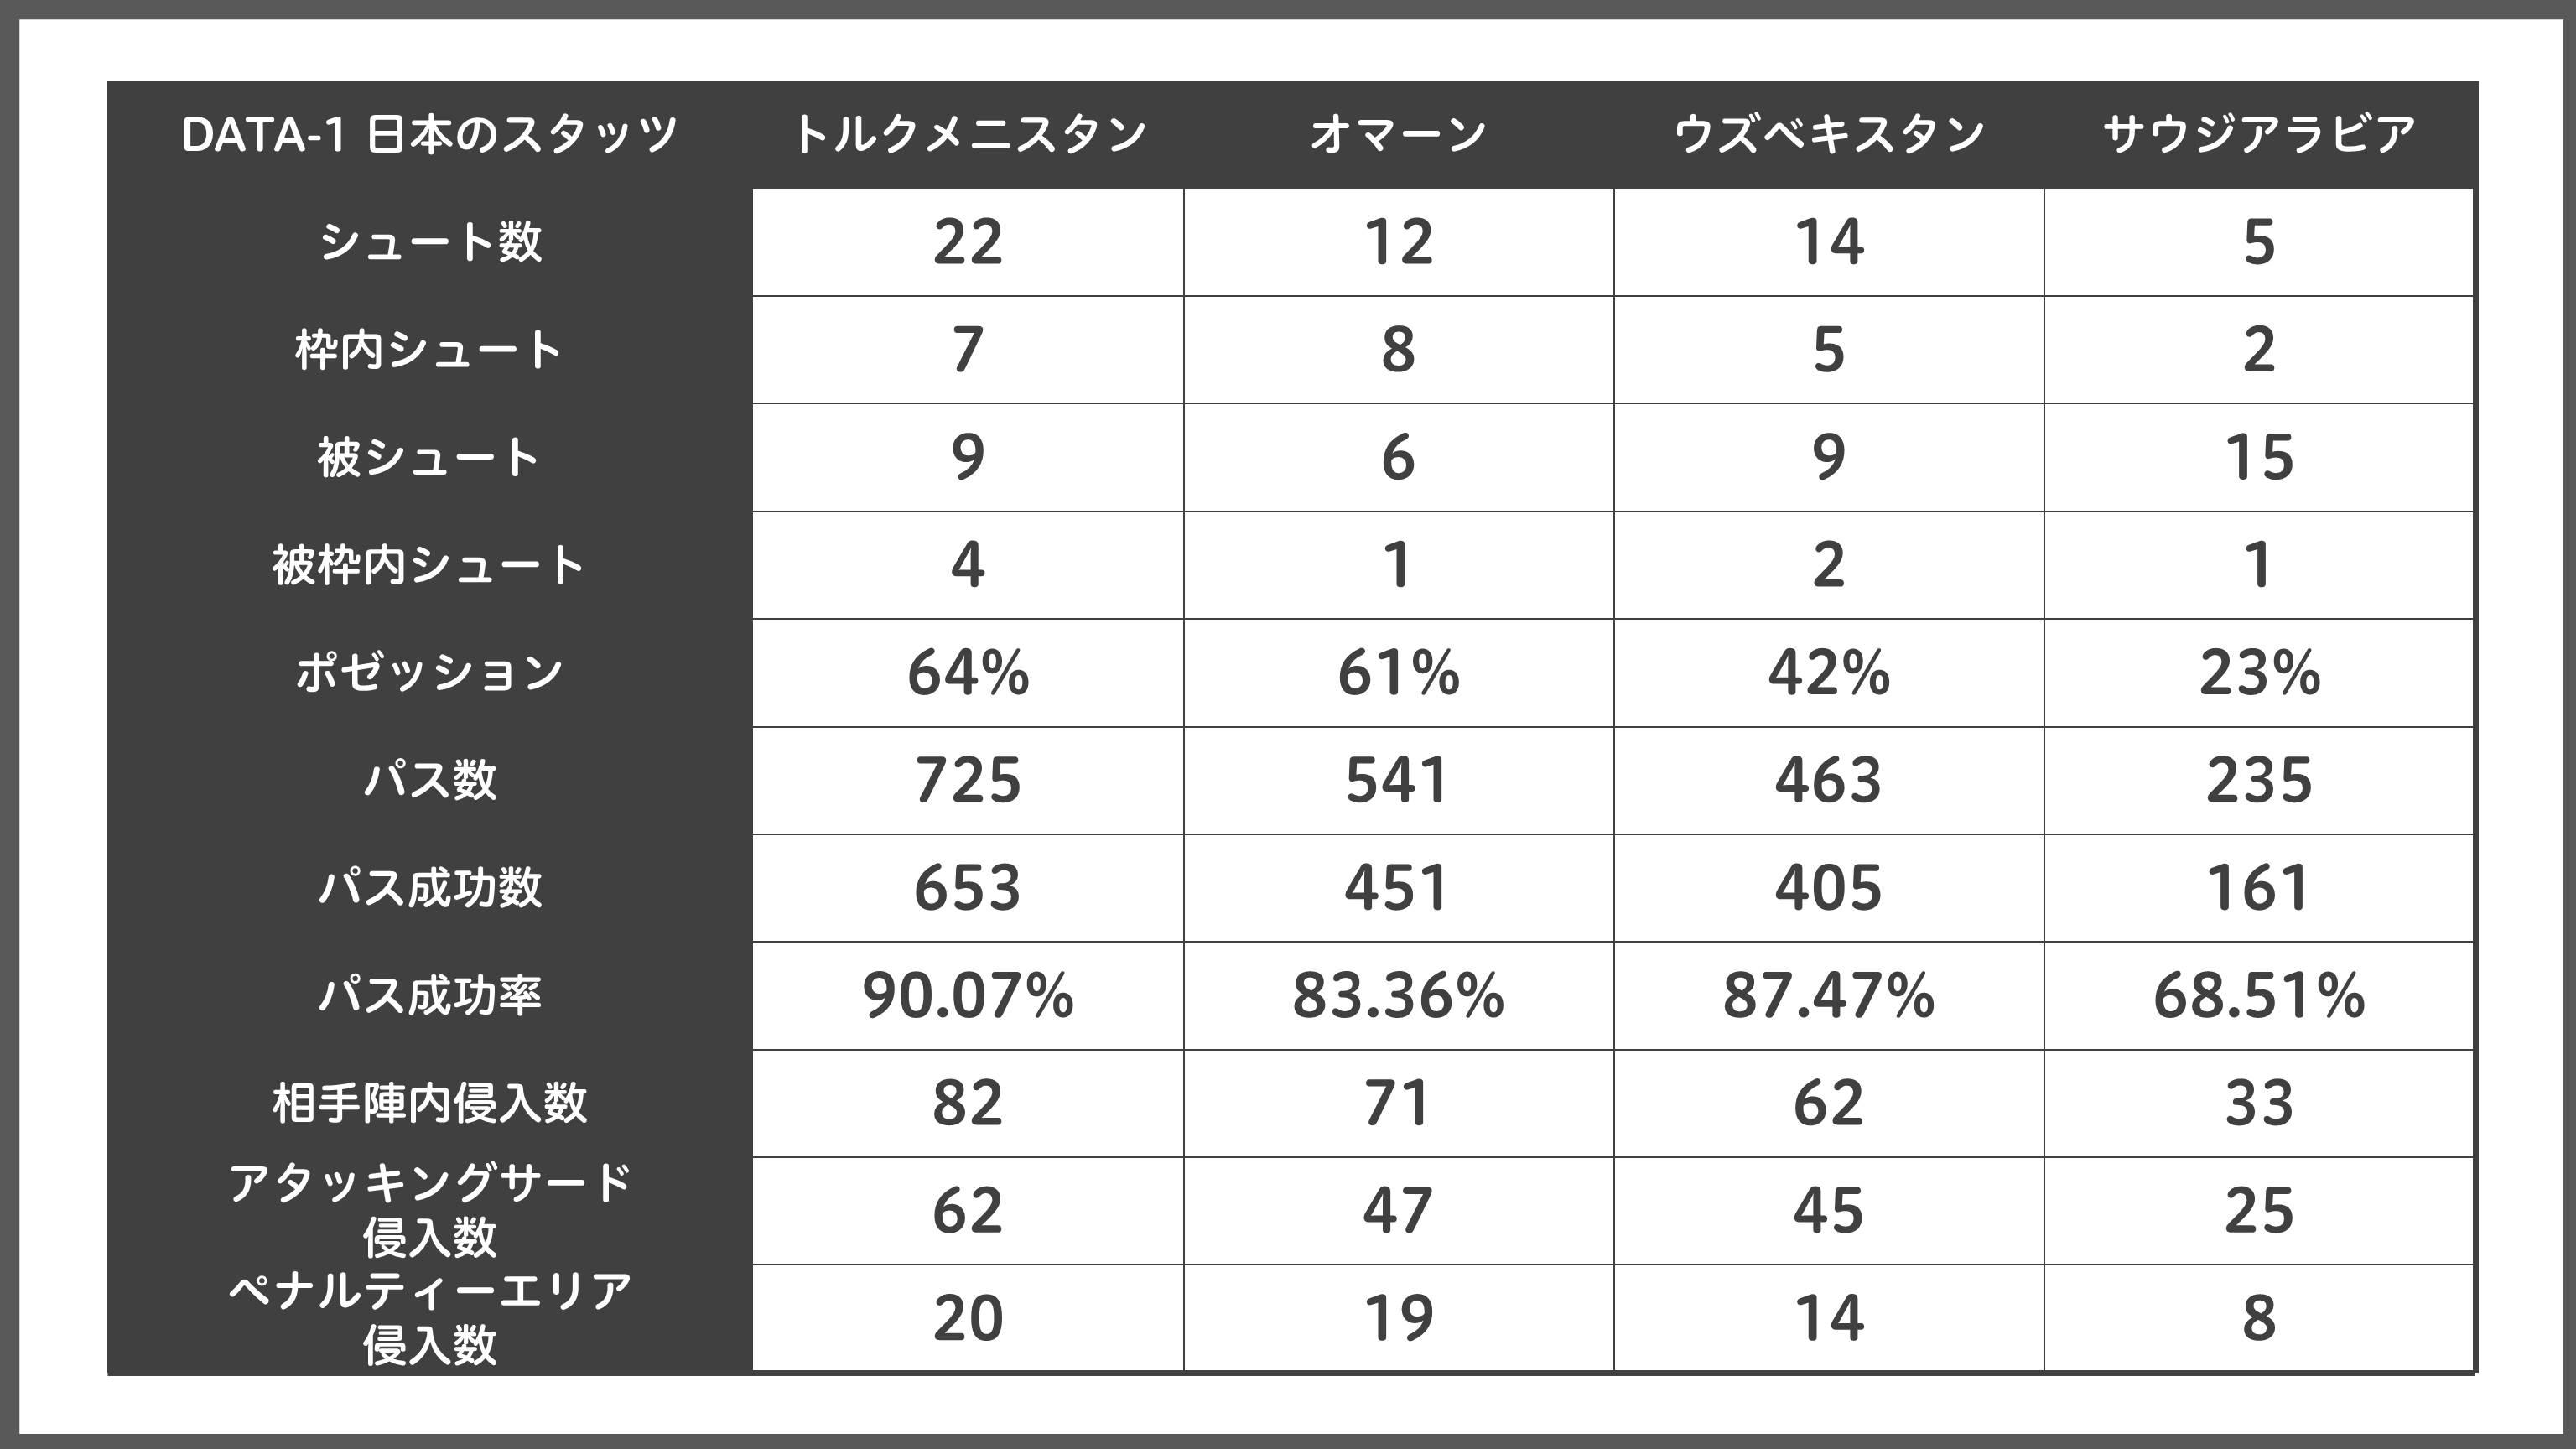 [DATA-1]日本代表のアジアカップ4試合のスタッツ【表:Evolving Data】